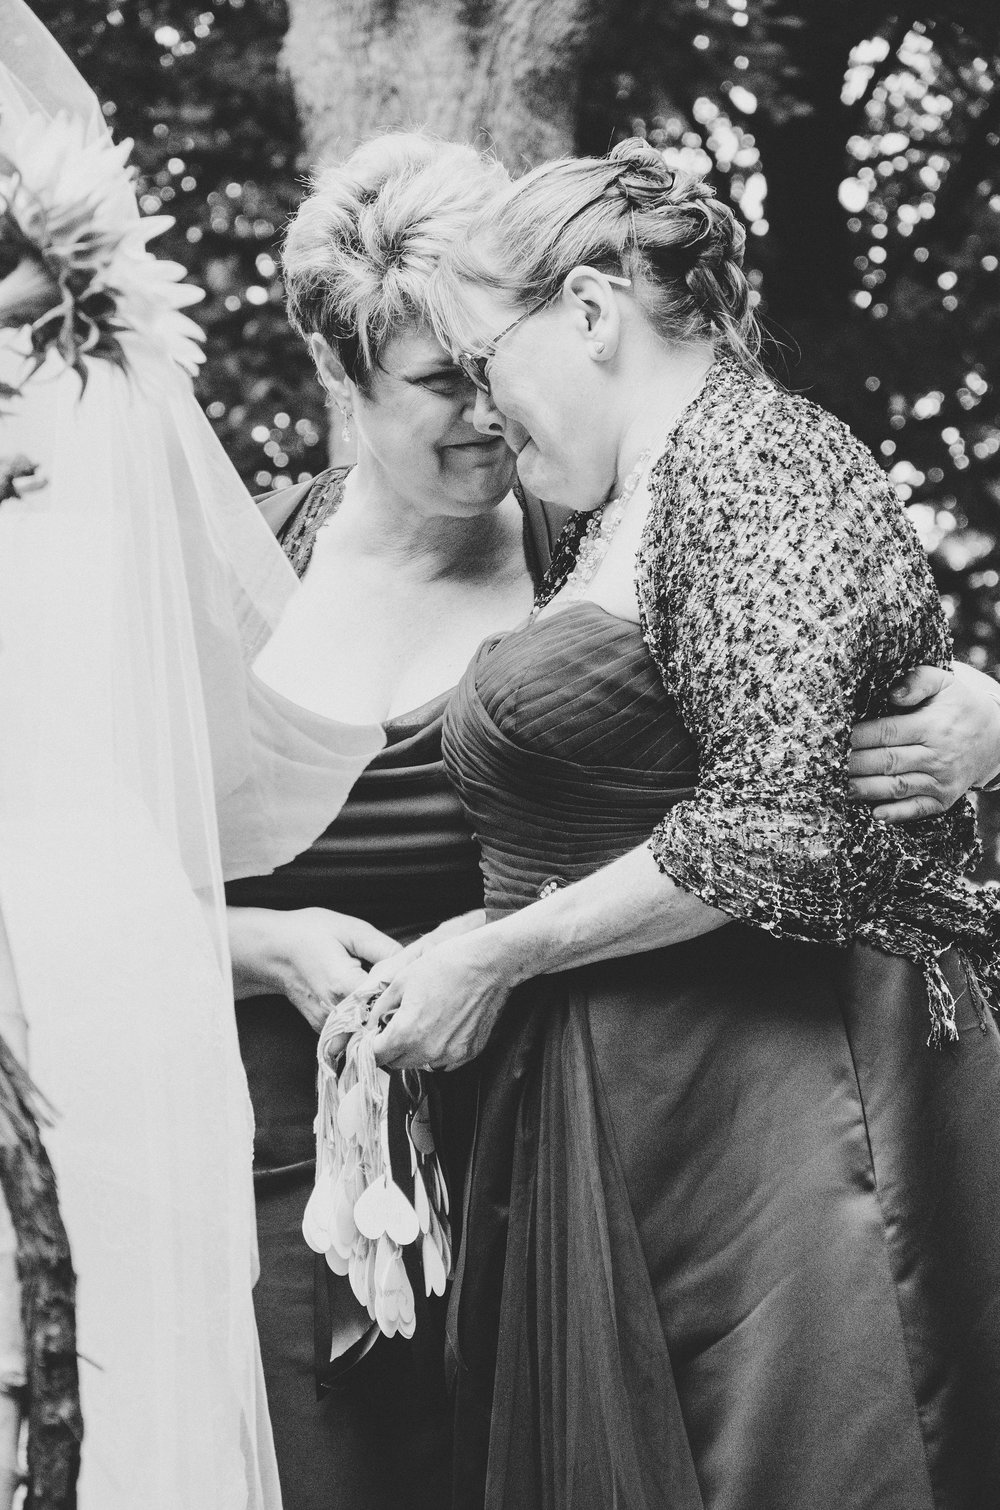 bw-mothers-of-bride-groom-embracing-tears